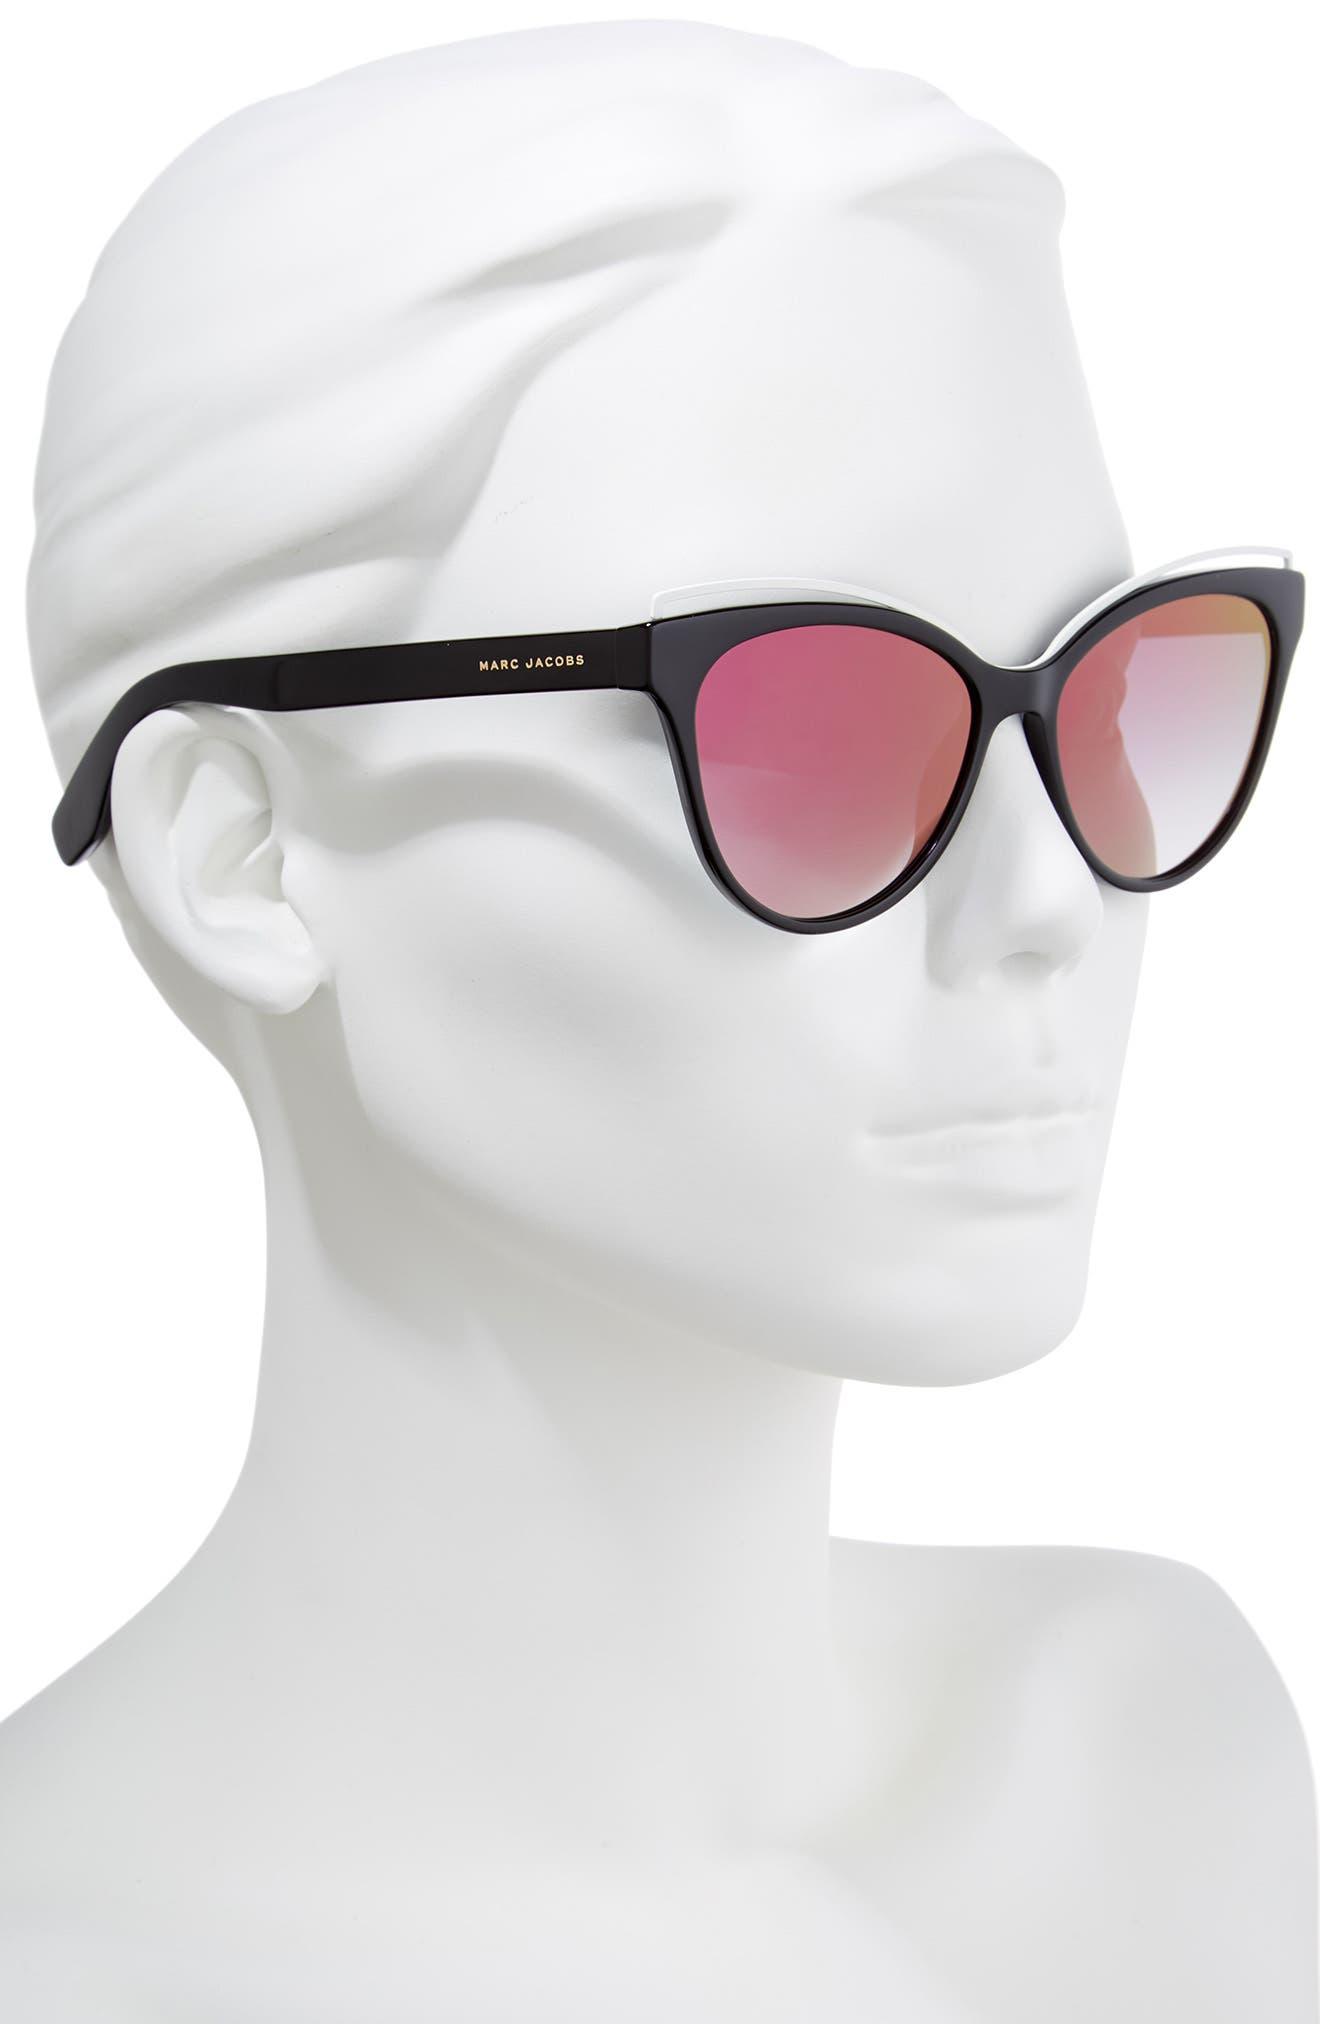 55mm Cat Eye Sunglasses,                             Alternate thumbnail 2, color,                             BLACK/ PINK